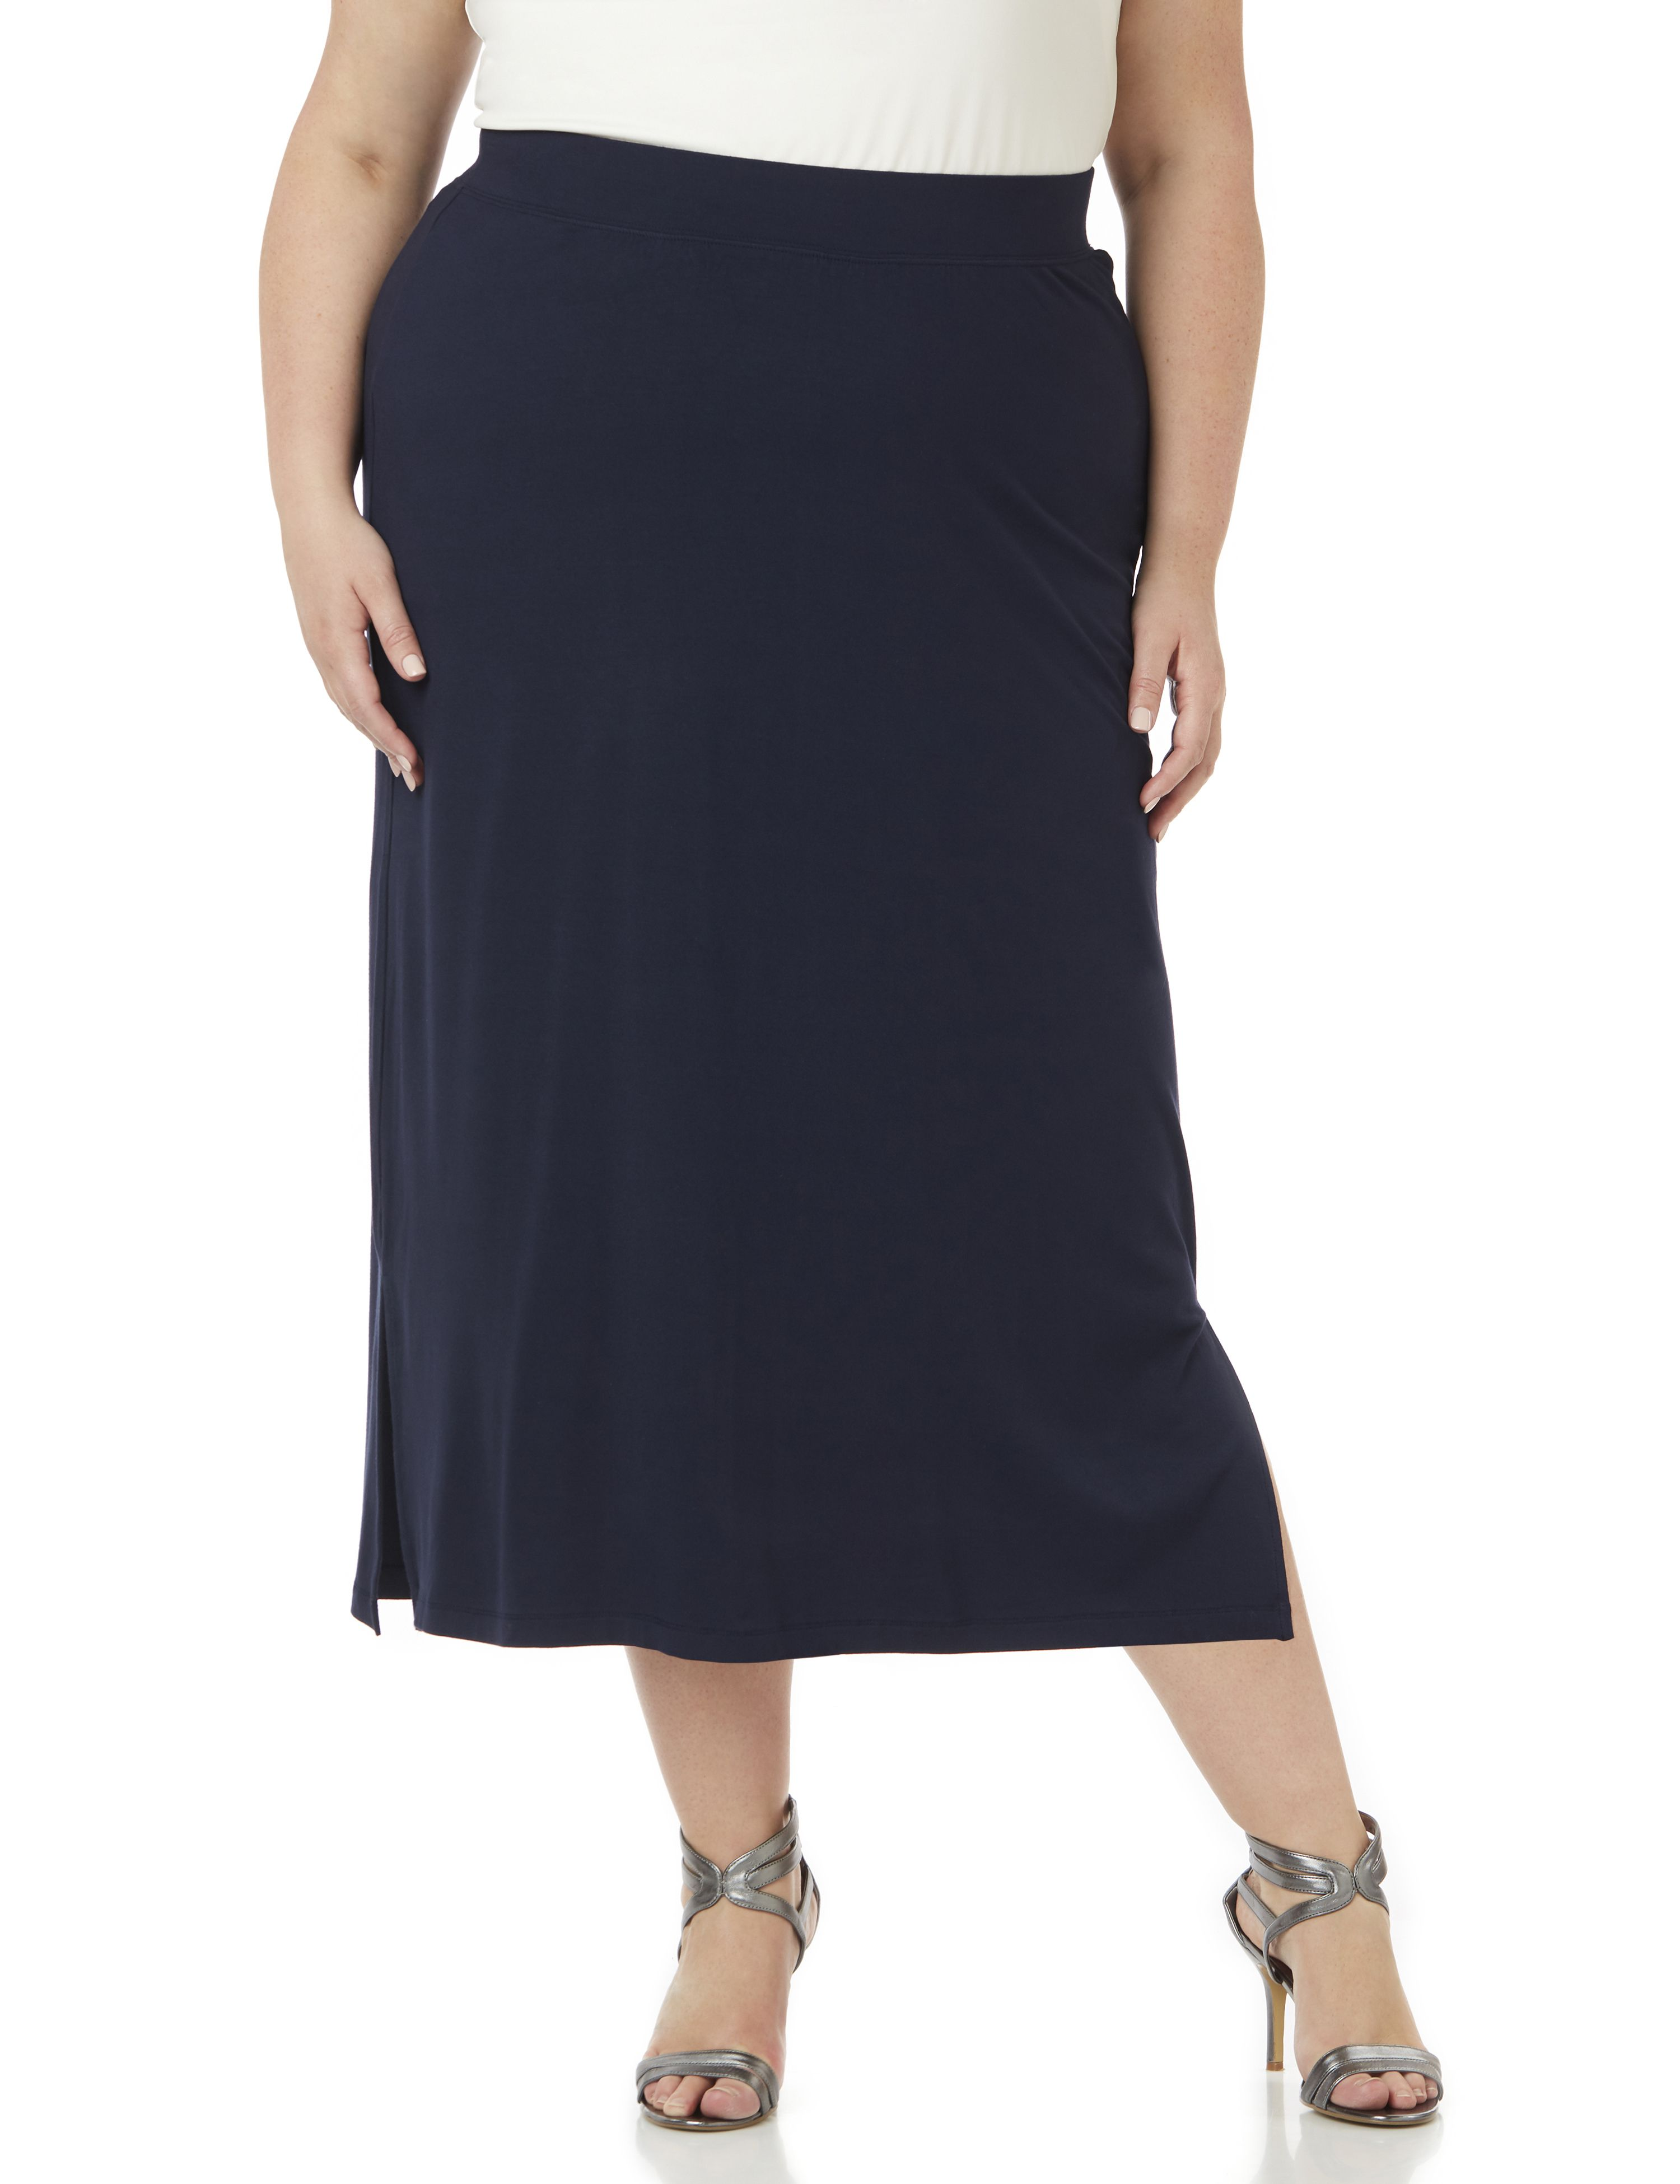 Tea Length 1930s Style Skirts for Sale AnyWear Midi Skirt $46.99 AT vintagedancer.com